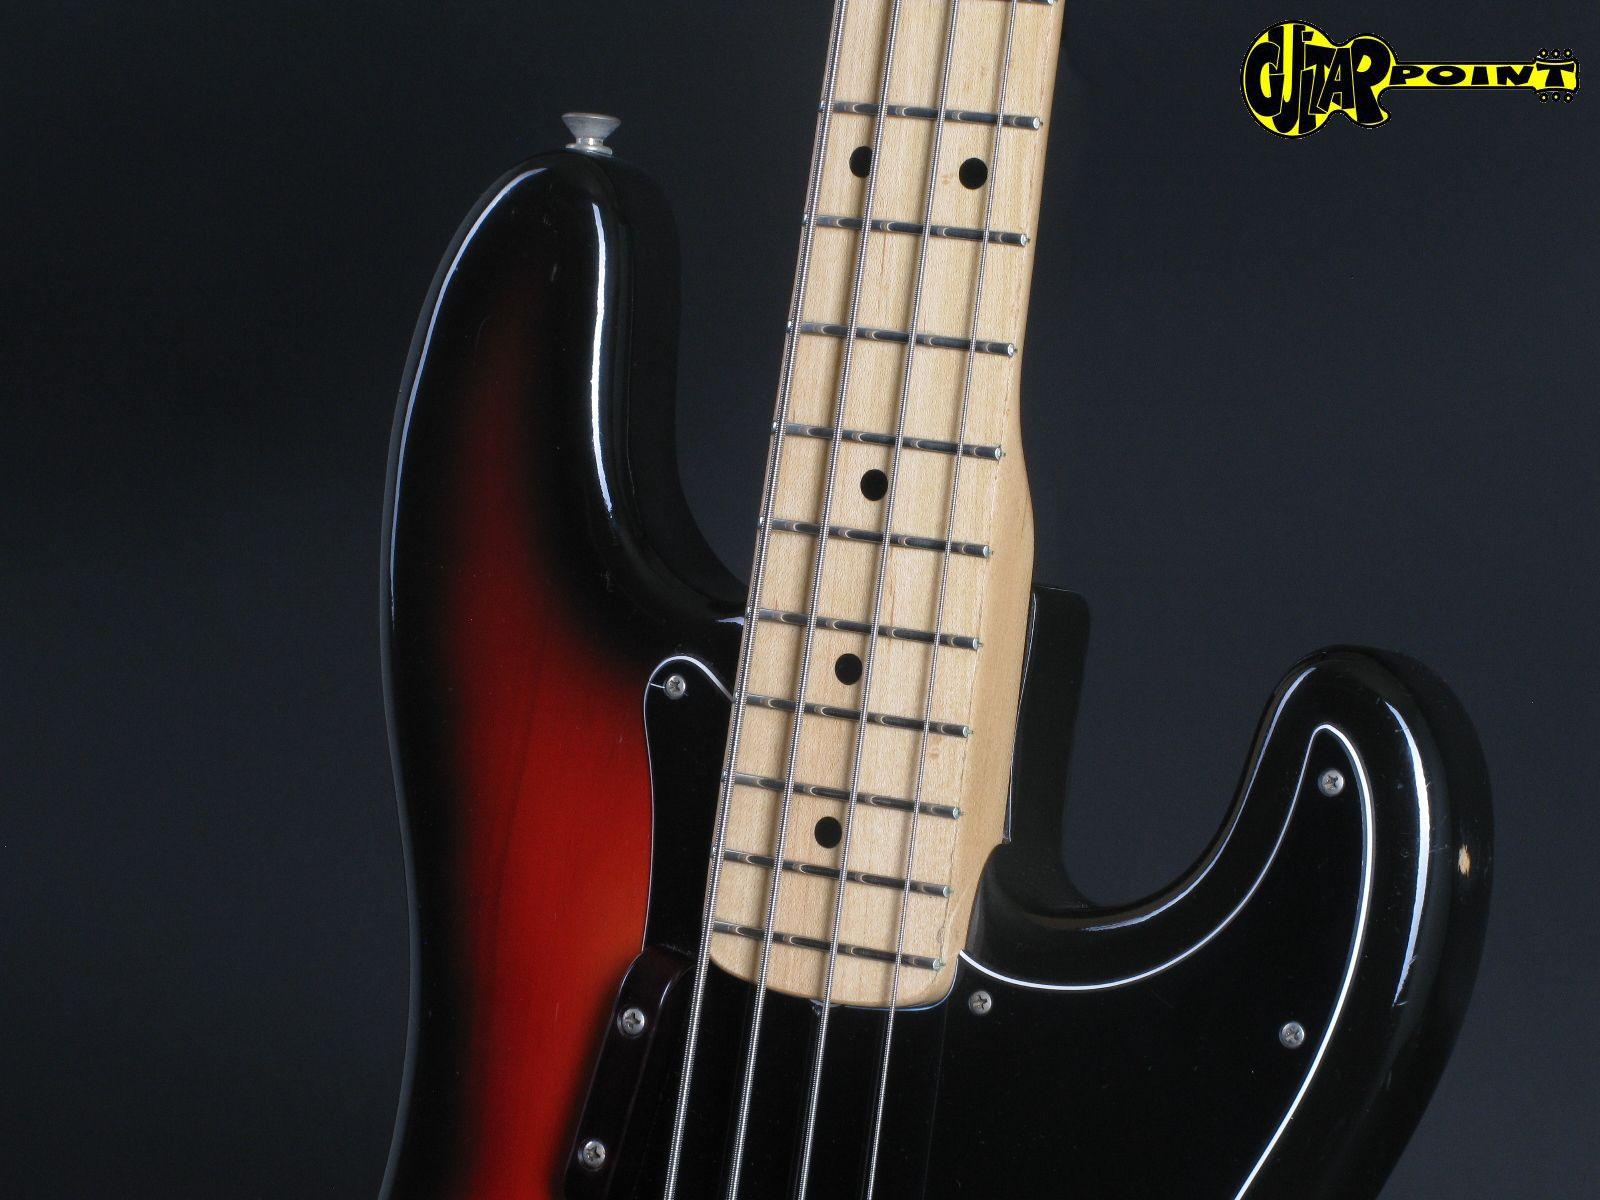 fender precision p bass 1975 3 tone sunburst bass for sale guitarpoint. Black Bedroom Furniture Sets. Home Design Ideas